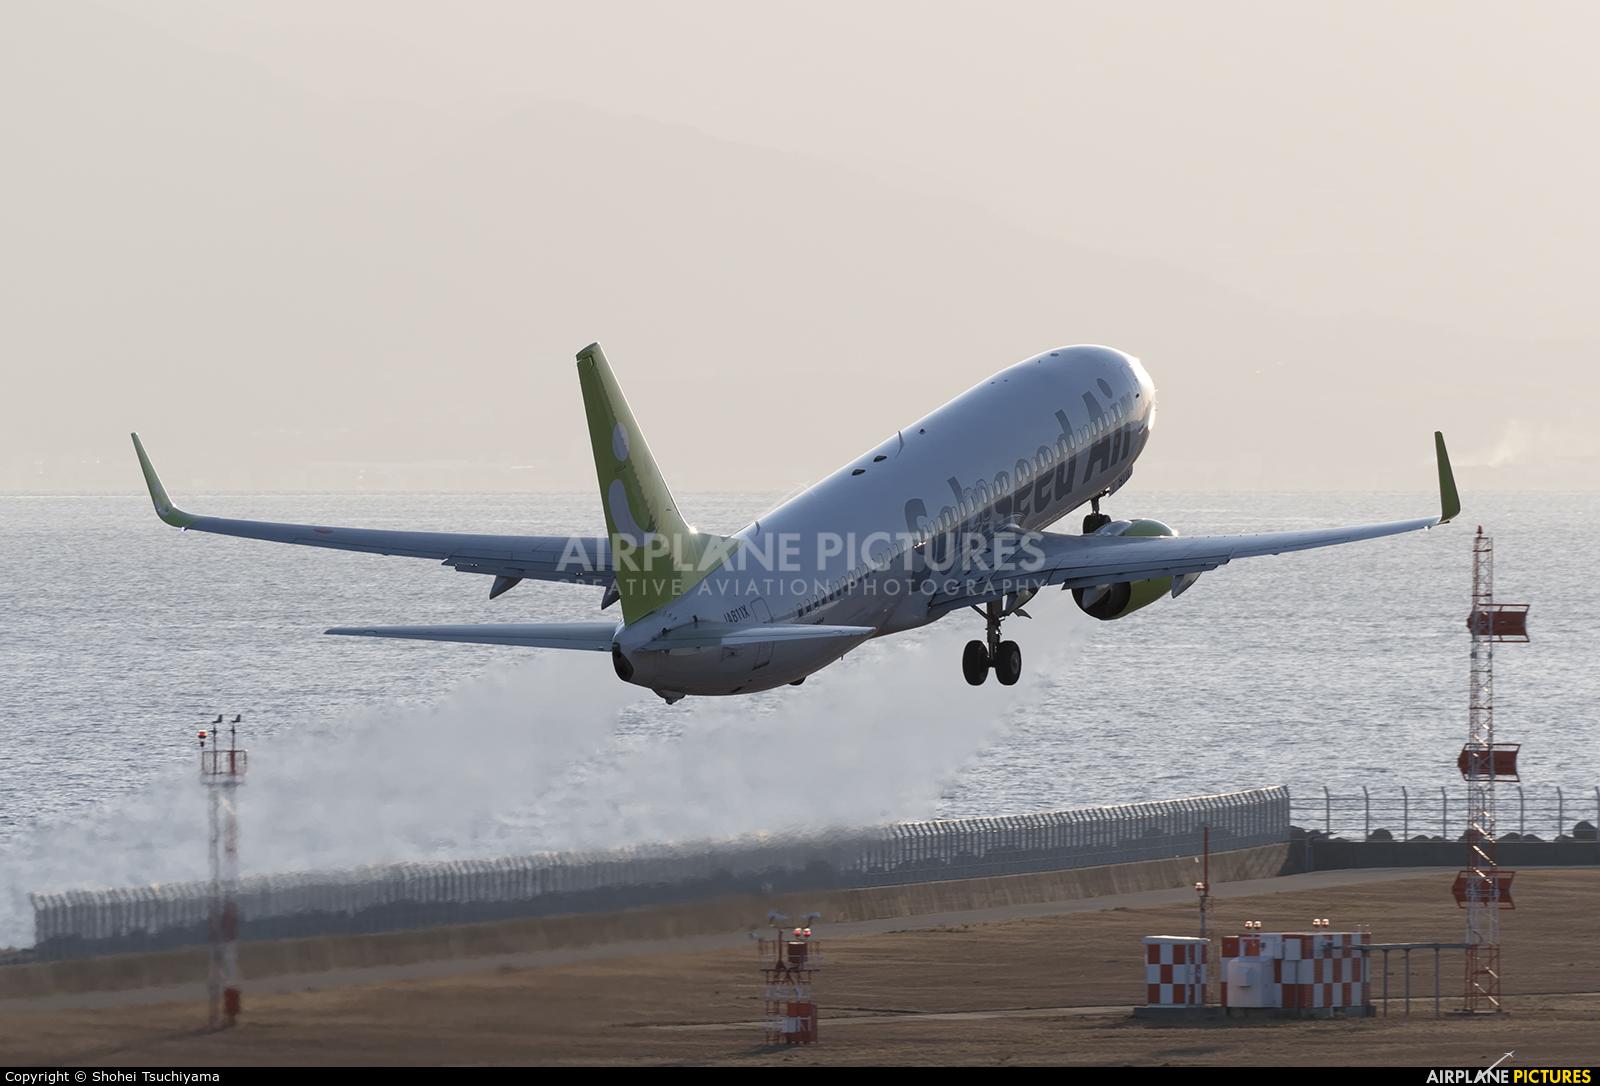 Solaseed Air - Skynet Asia Airways JA811X aircraft at Kobe